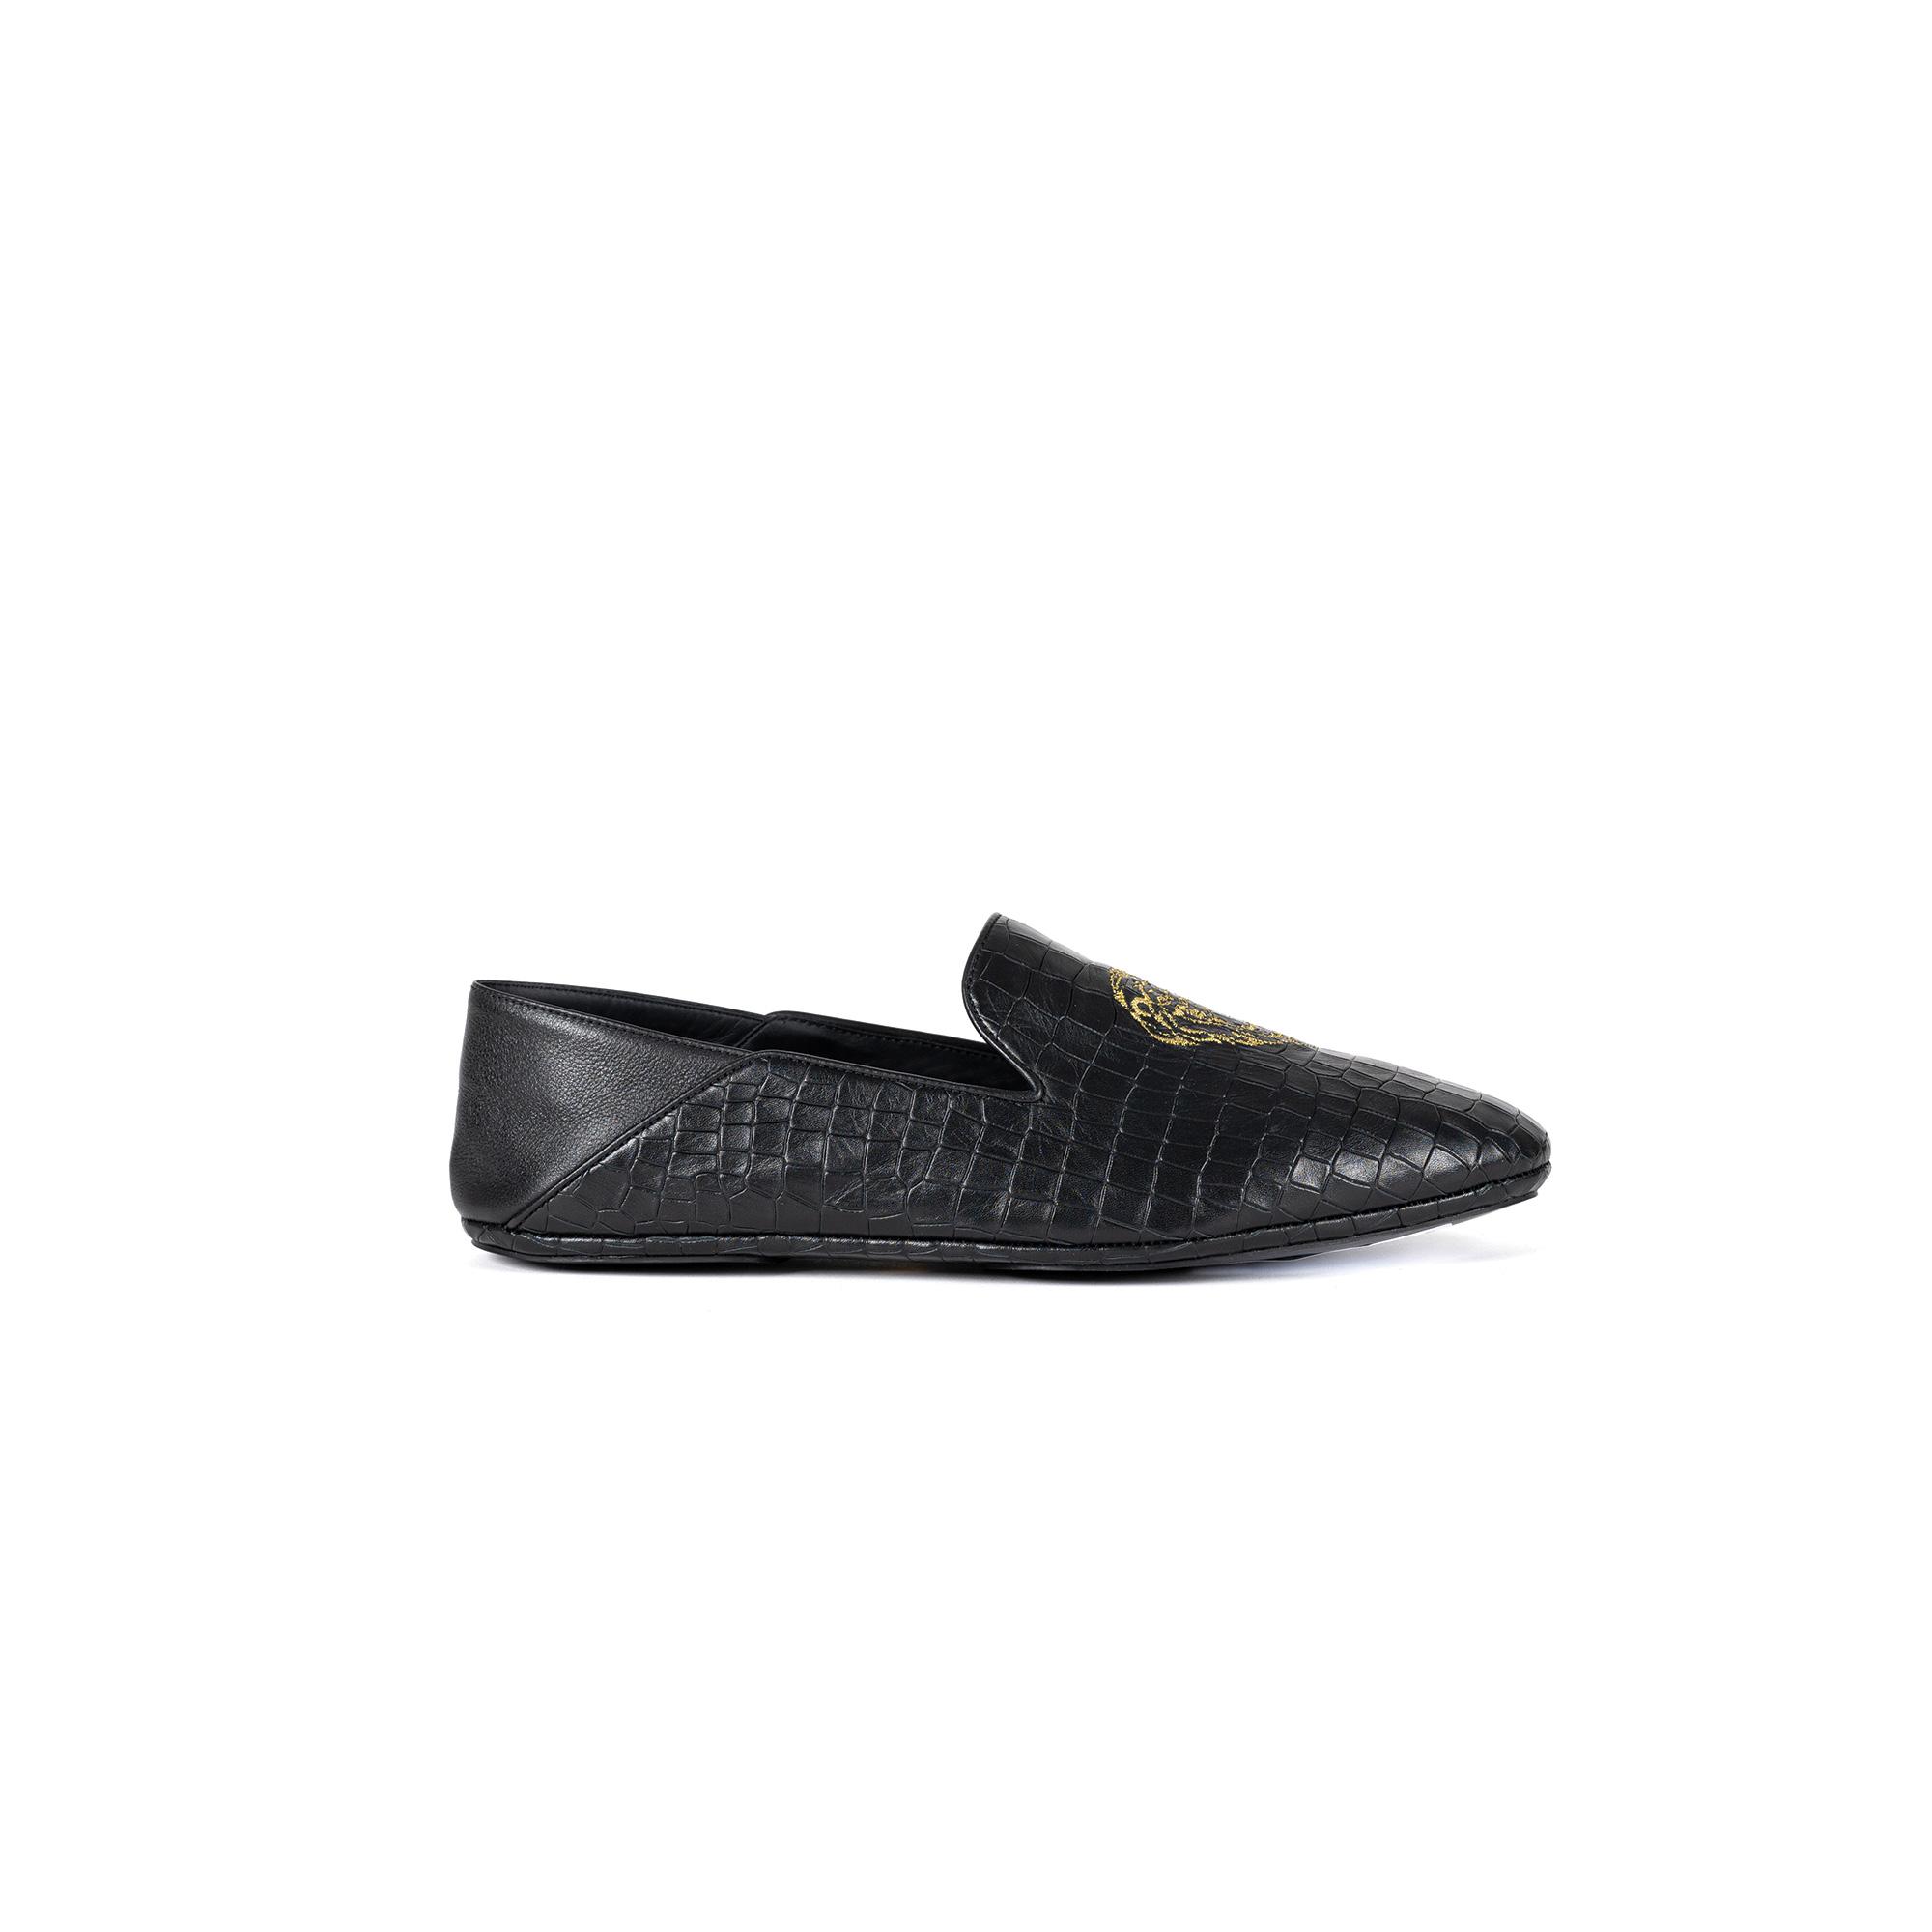 Indoor luxury slipper closed in cocco print leather - Farfalla italian slippers